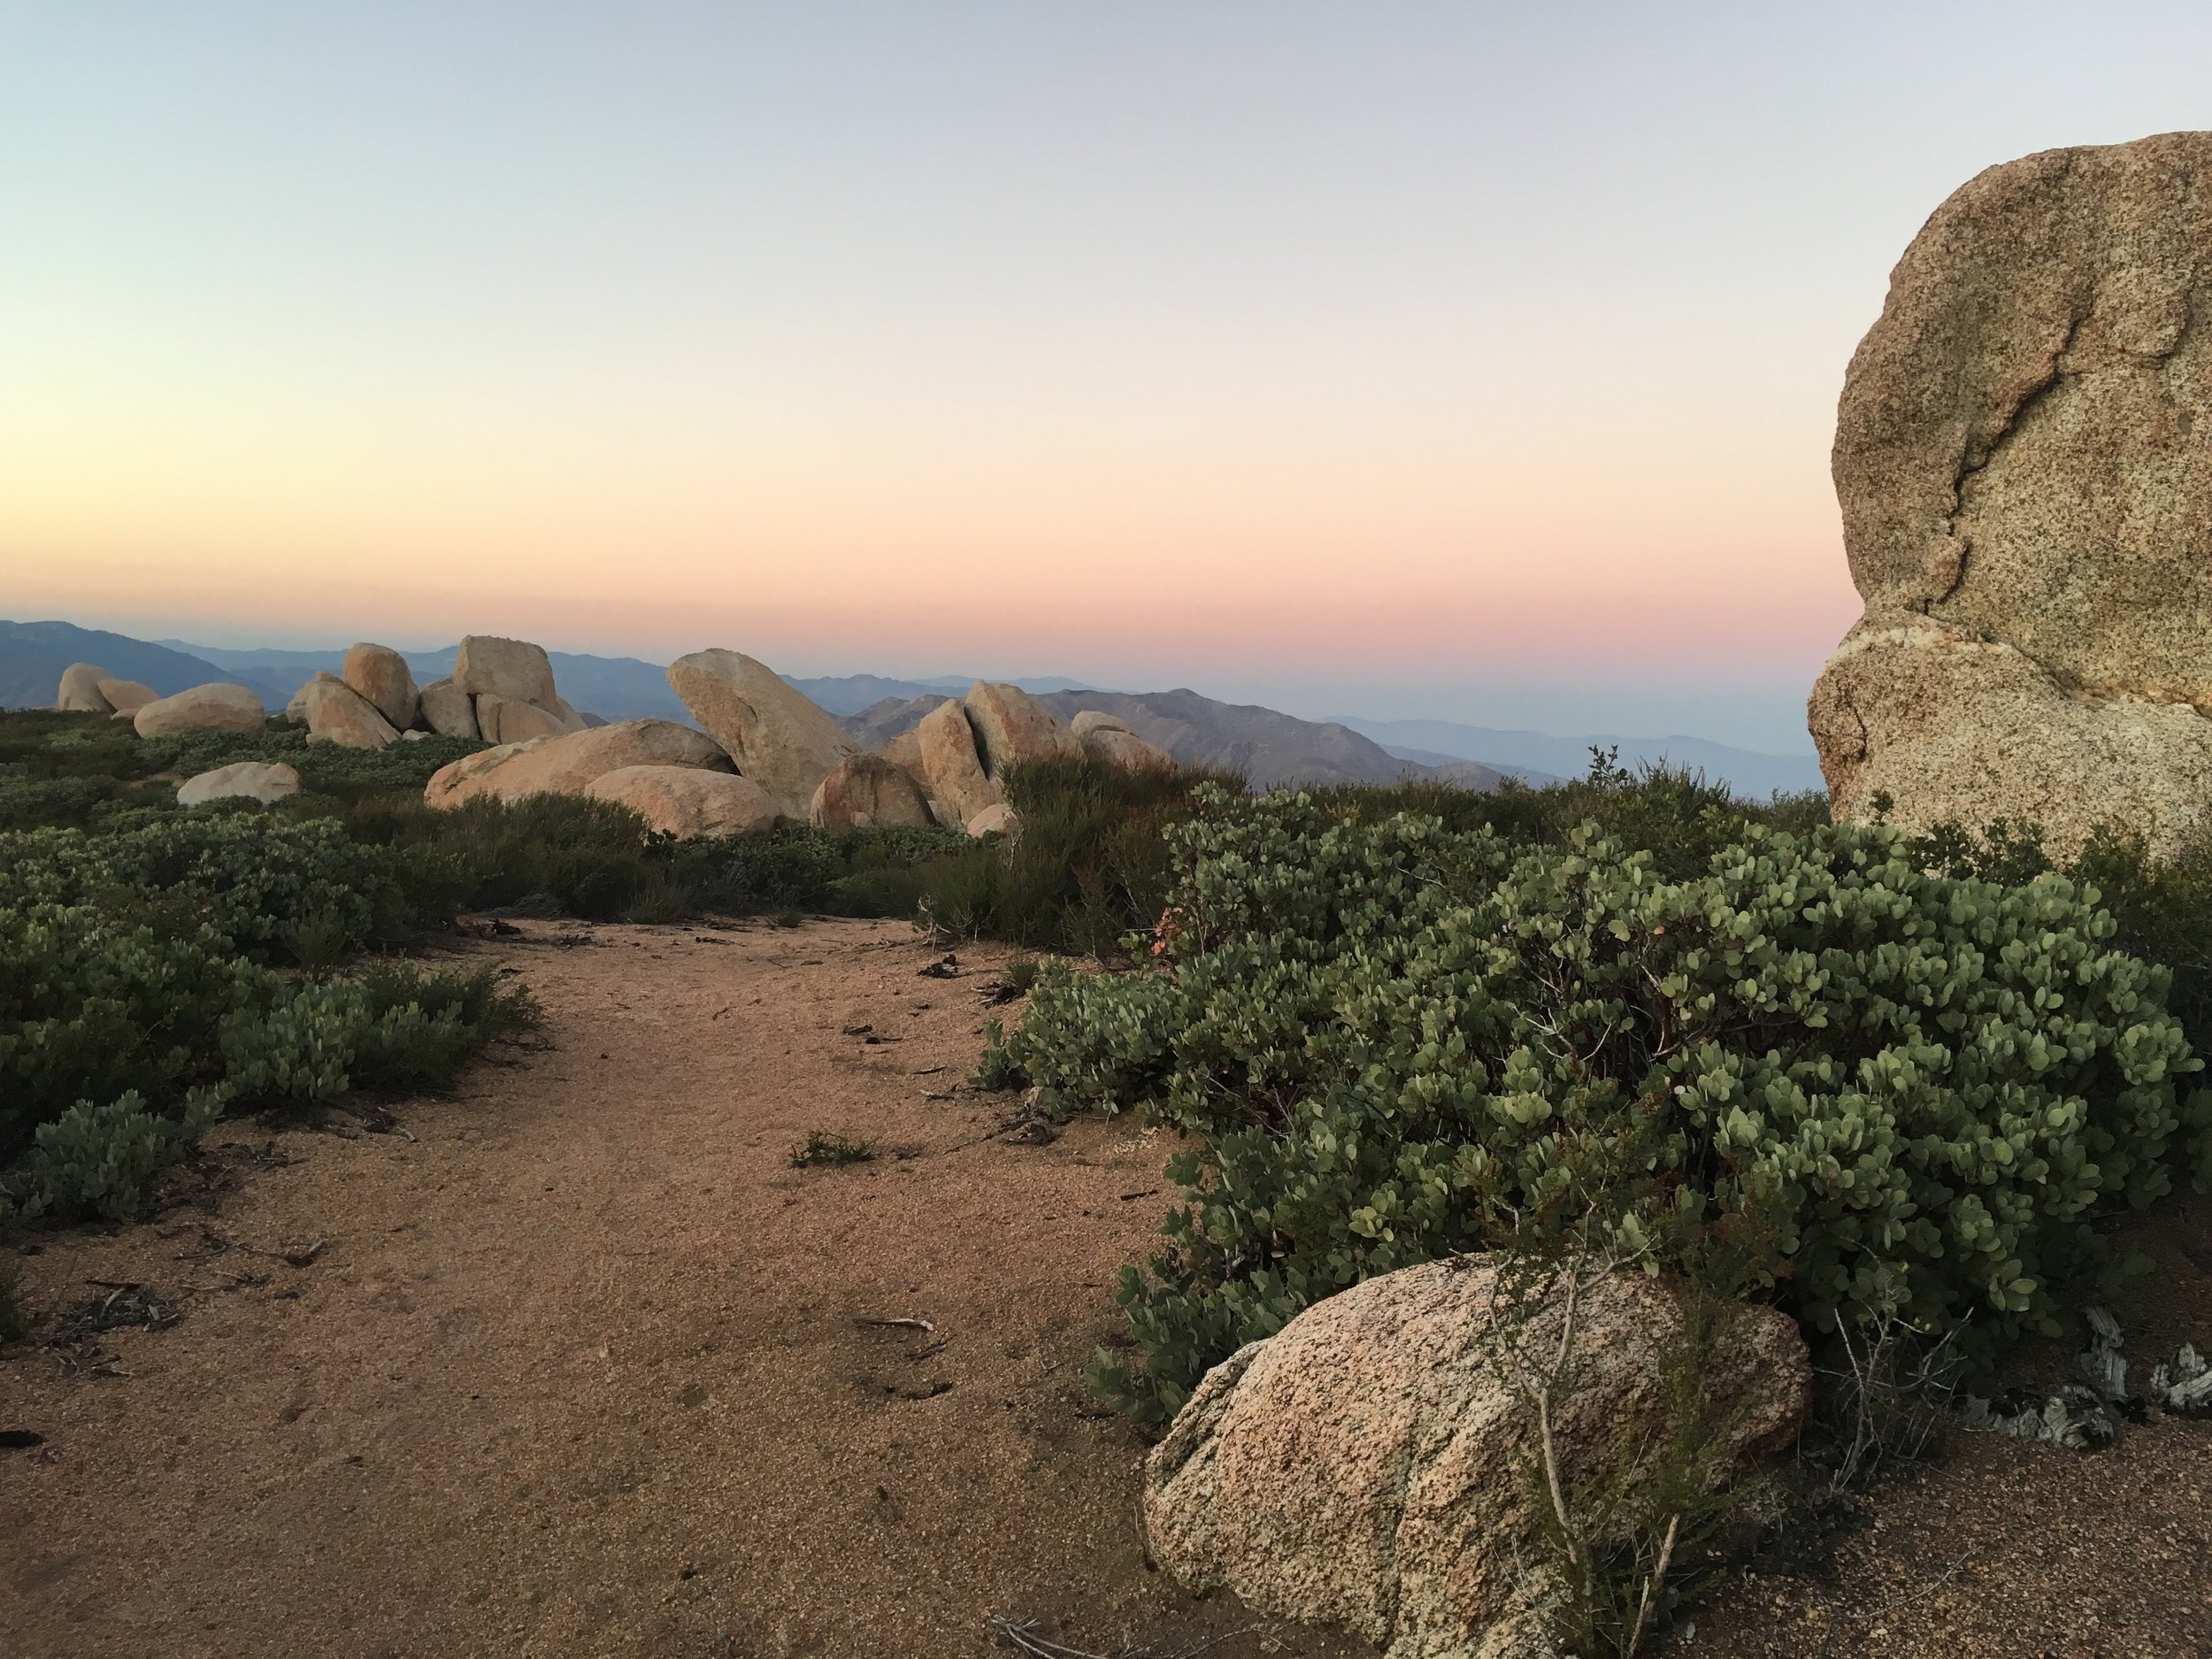 Dusk amongst the granite and manzanita of Garnet Mountain.